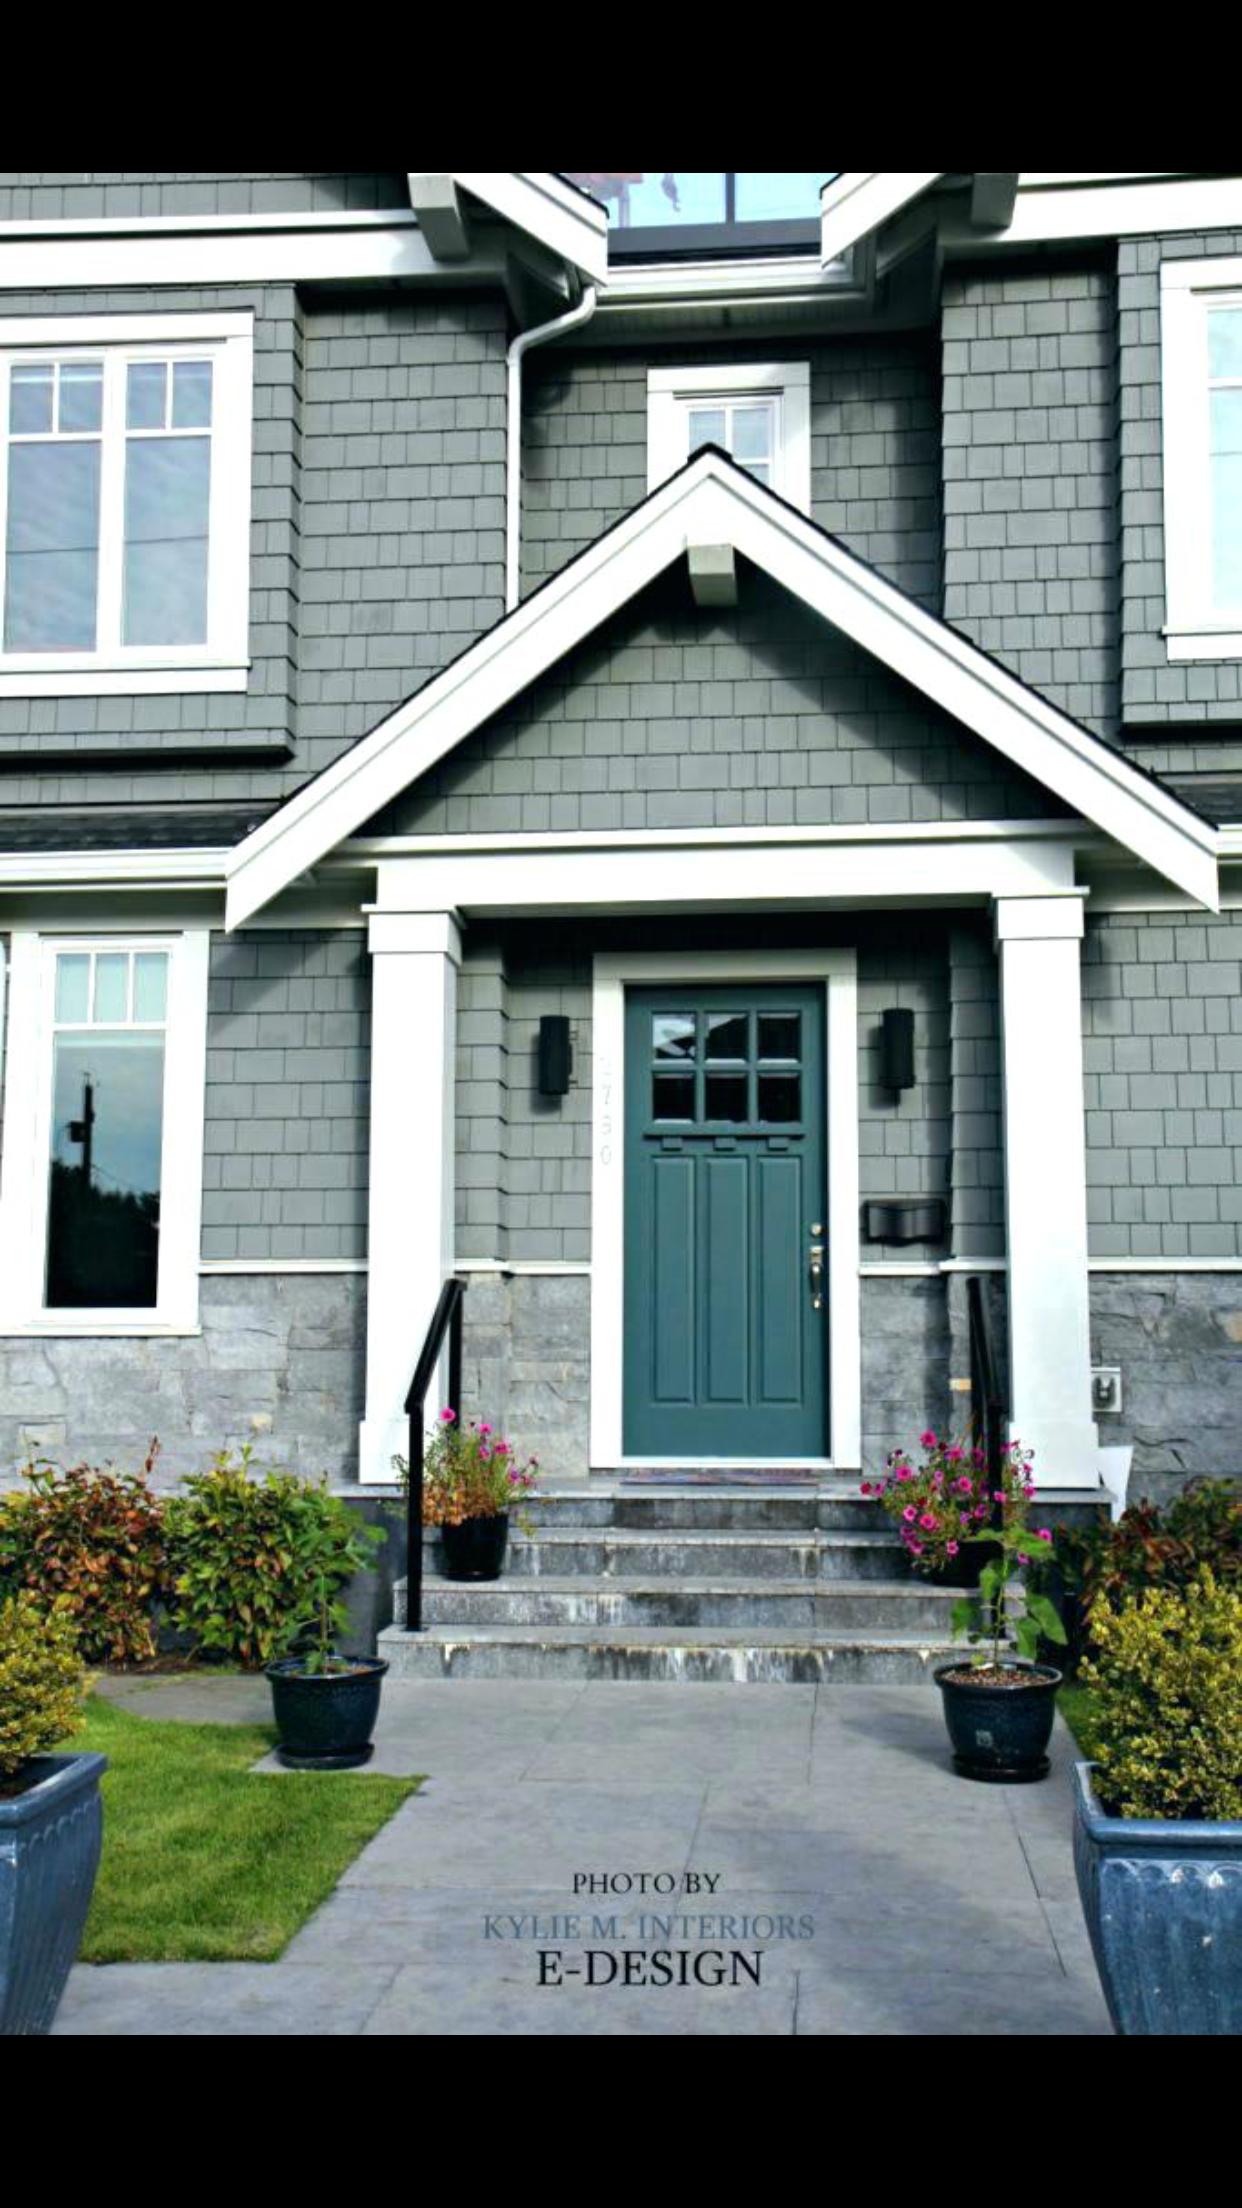 Pin by teresa immen on home in pinterest doors exterior